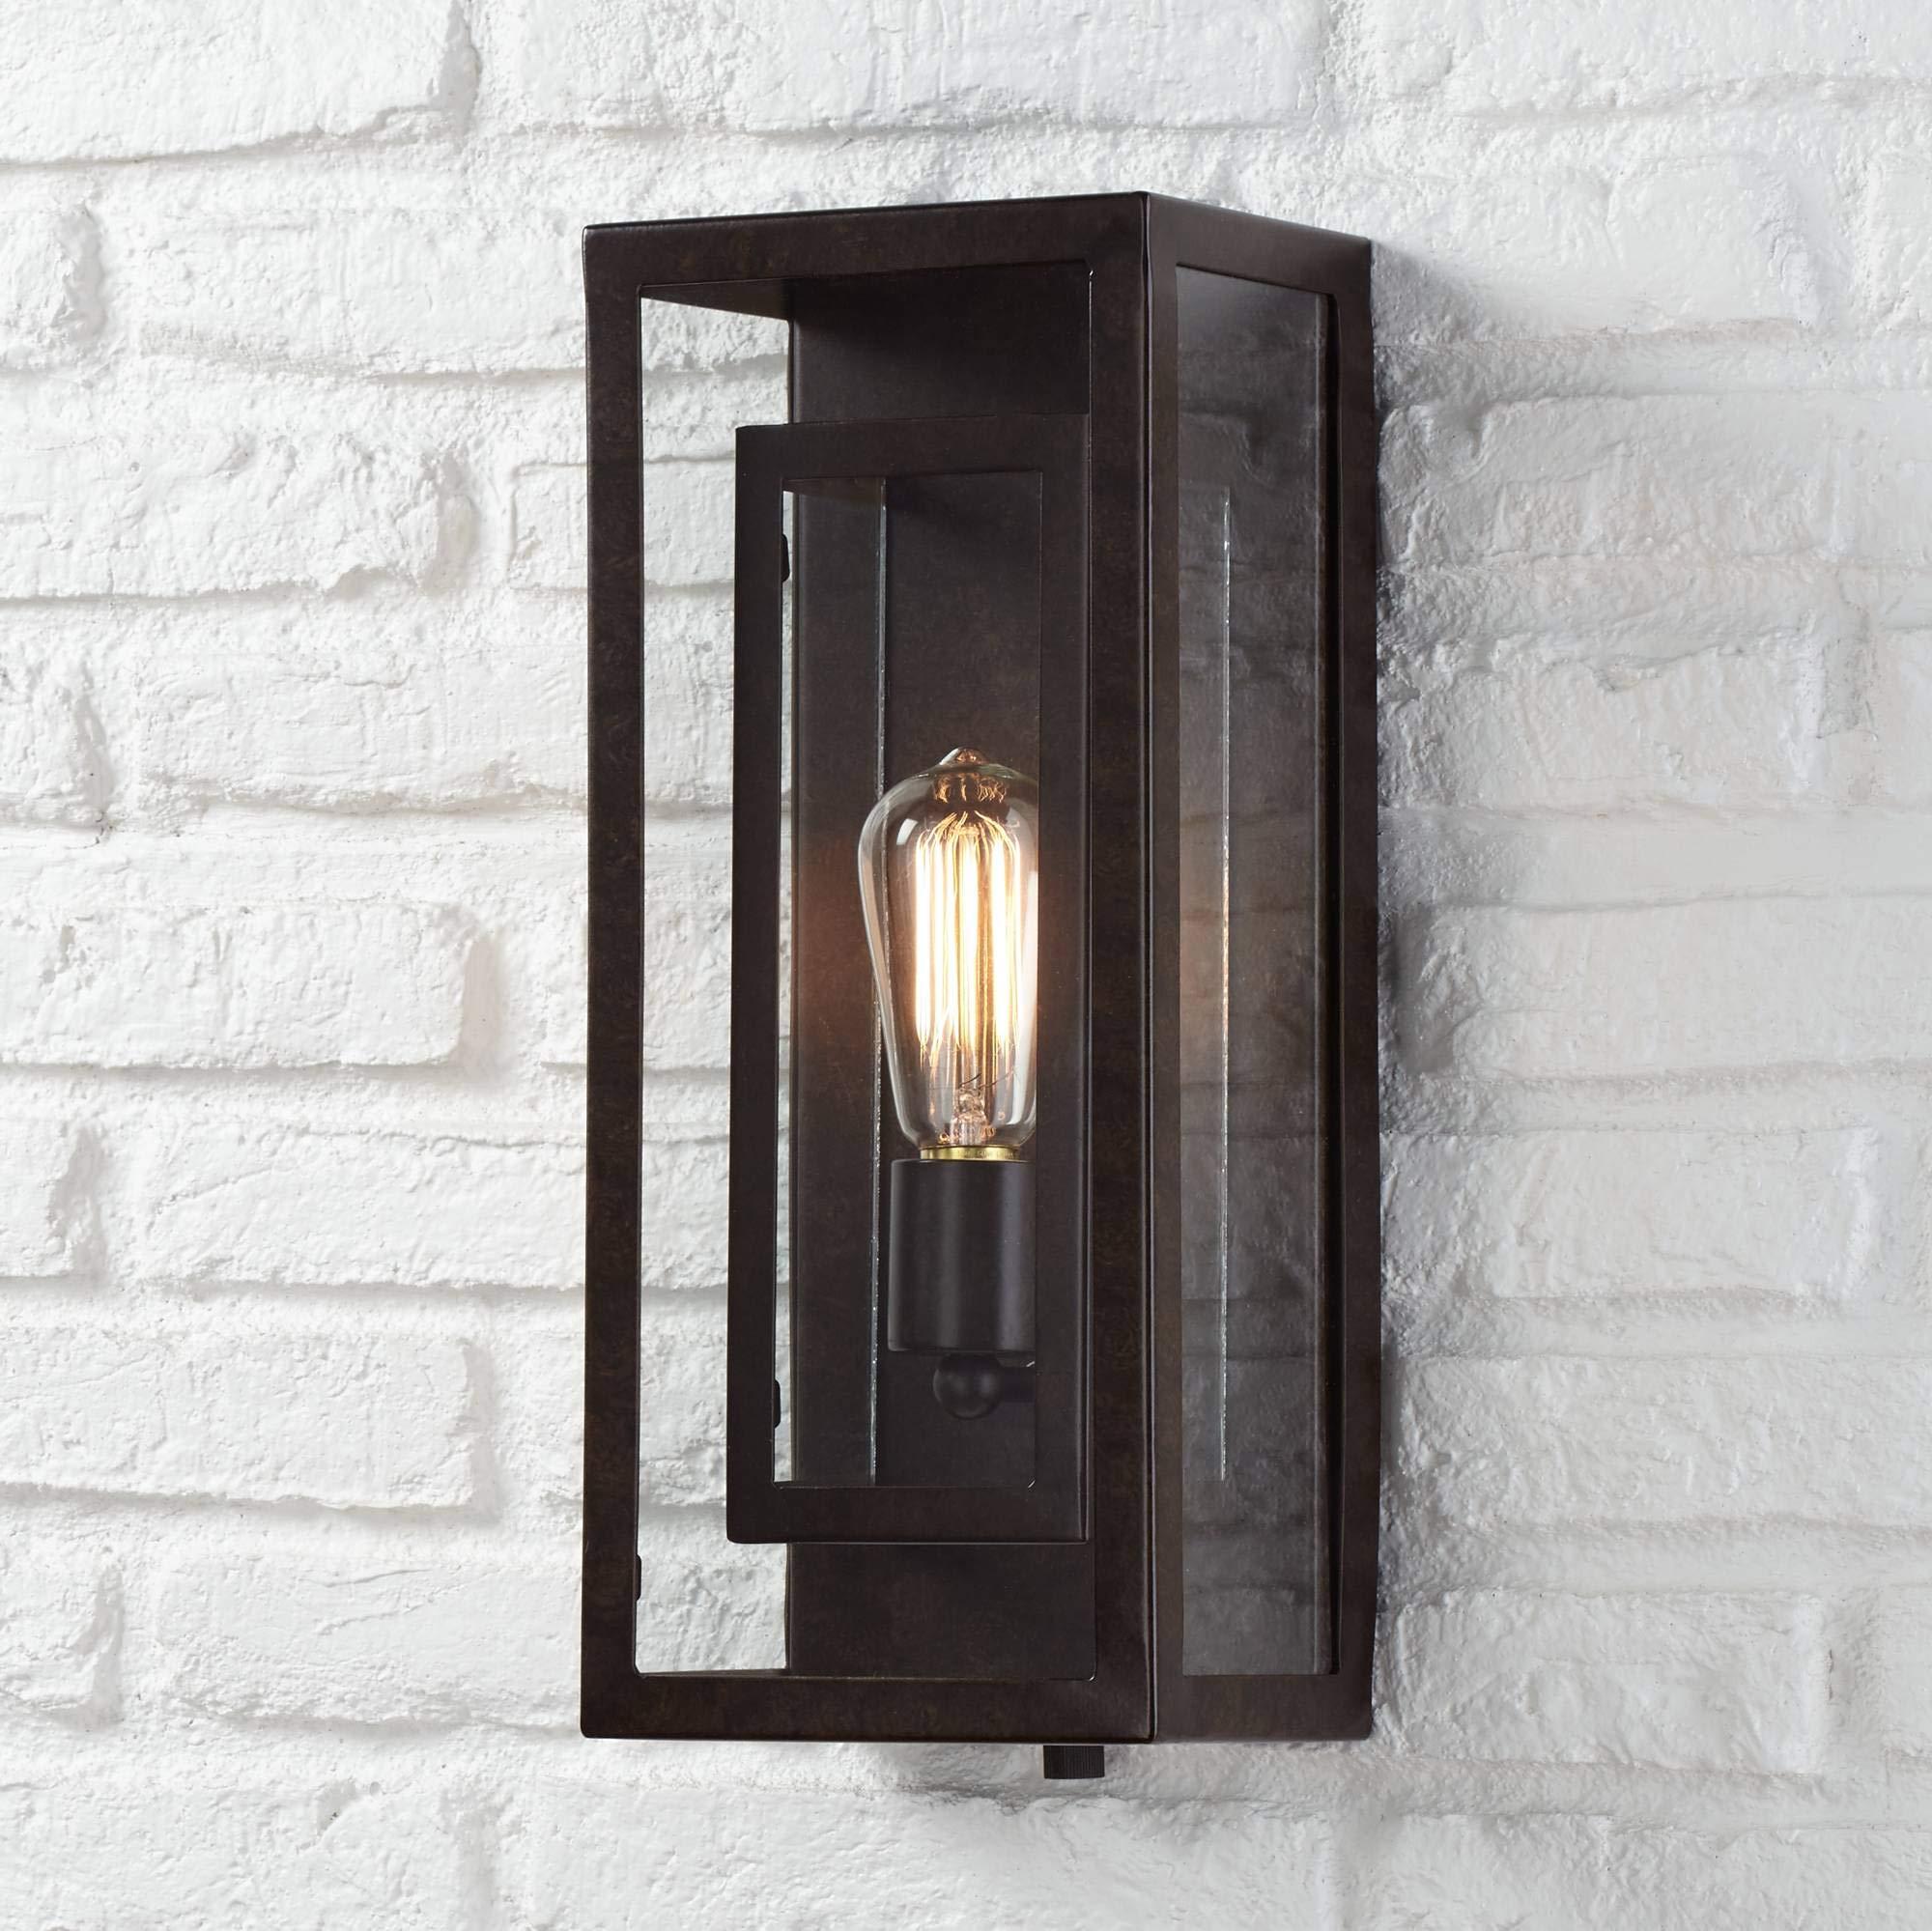 Modern Outdoor Wall Light Fixture Bronze Double Box 15 1/2'' Clear Glass Exterior House Deck - Possini Euro Design